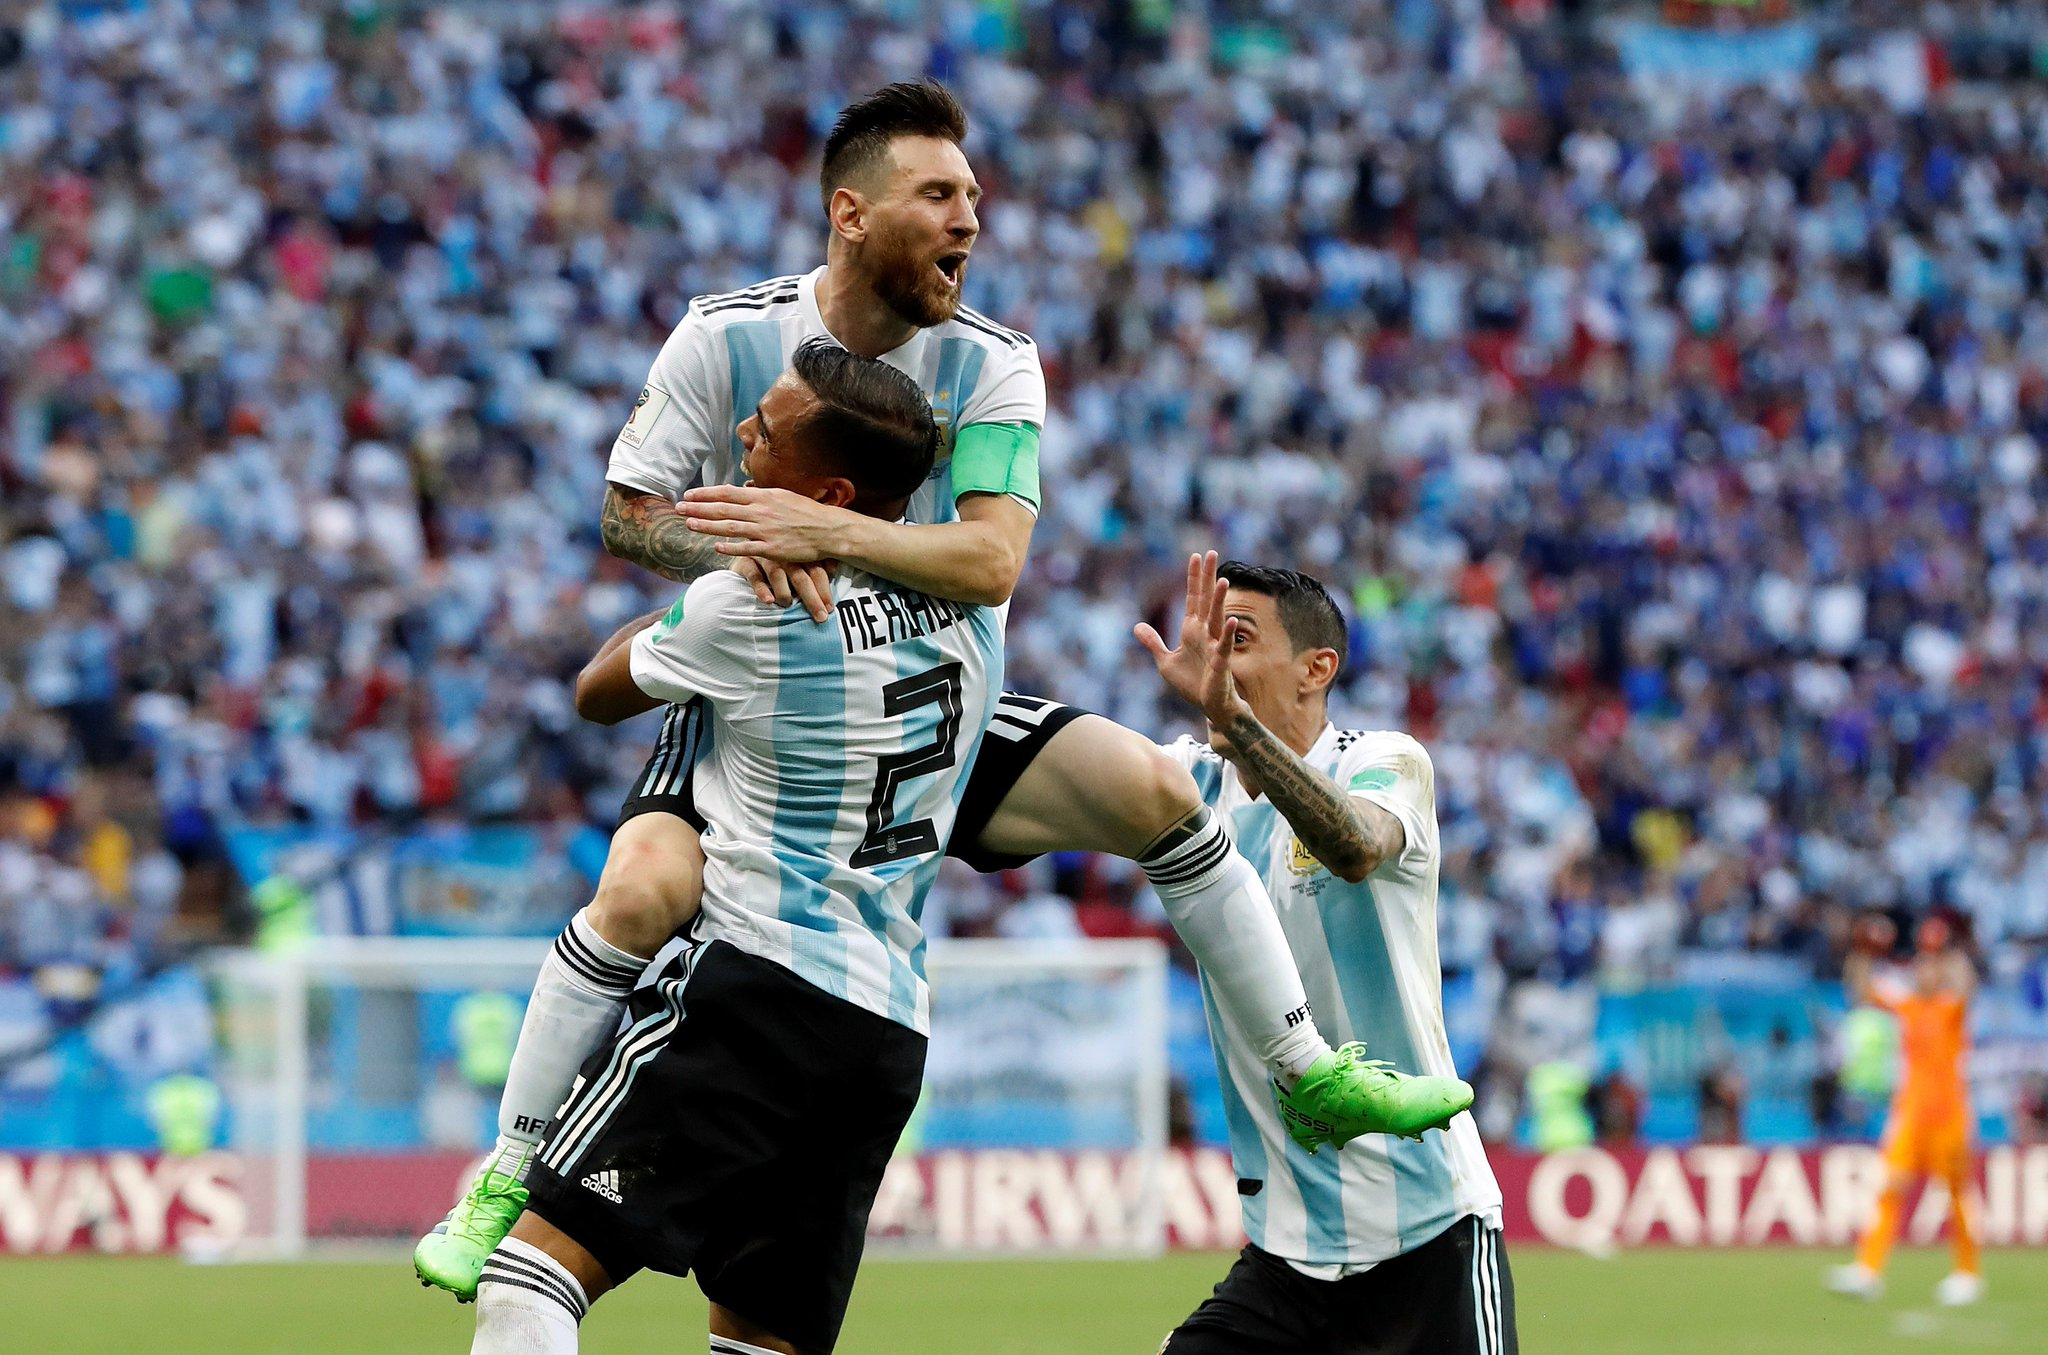 всегда фото аргентина завтра фото видео можно